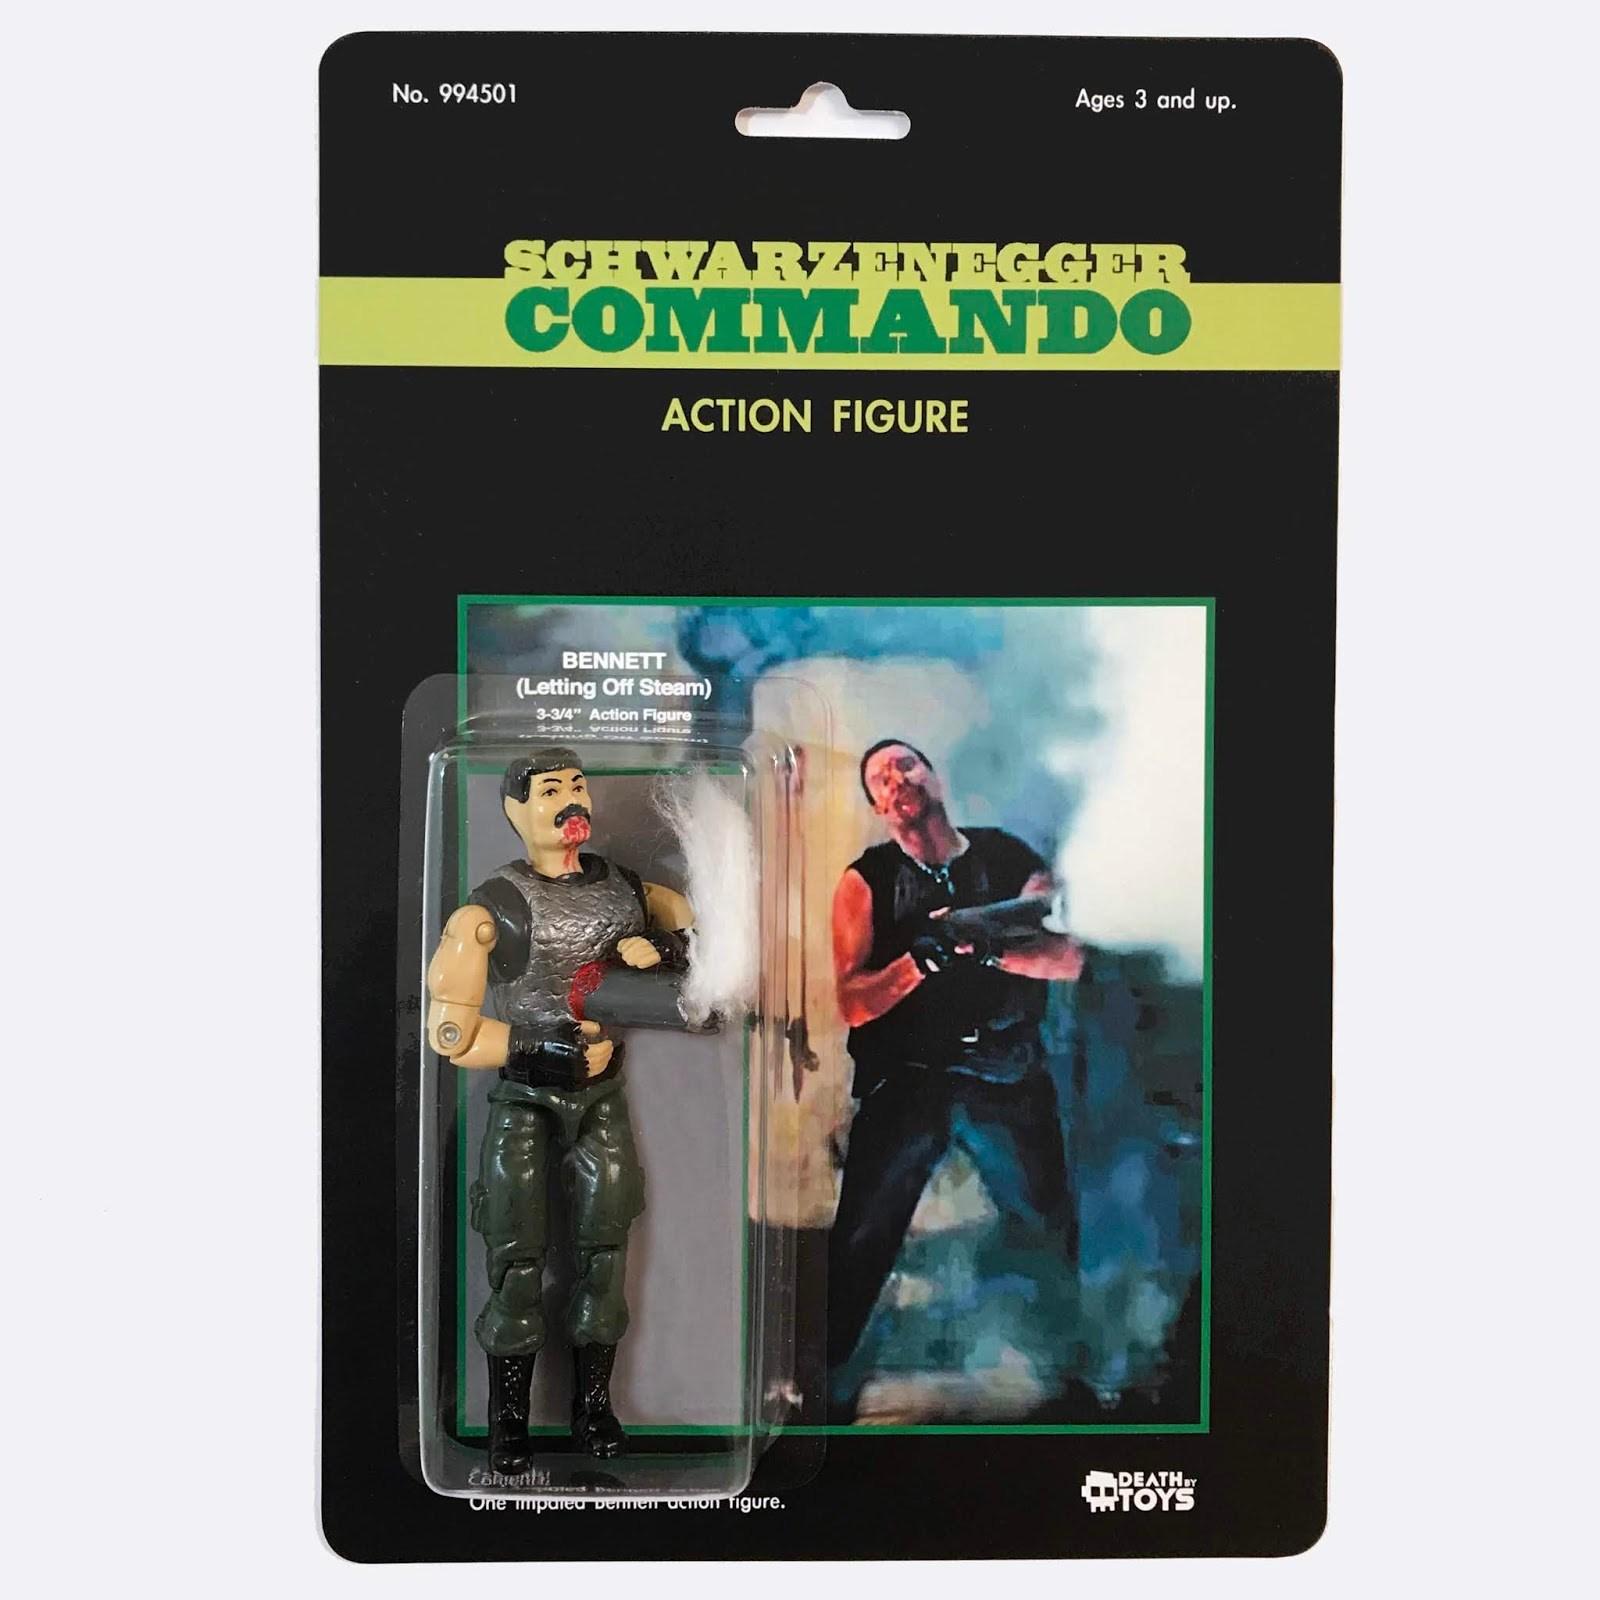 Dan Polydoris action figures customizzate morti anni '80 (3)